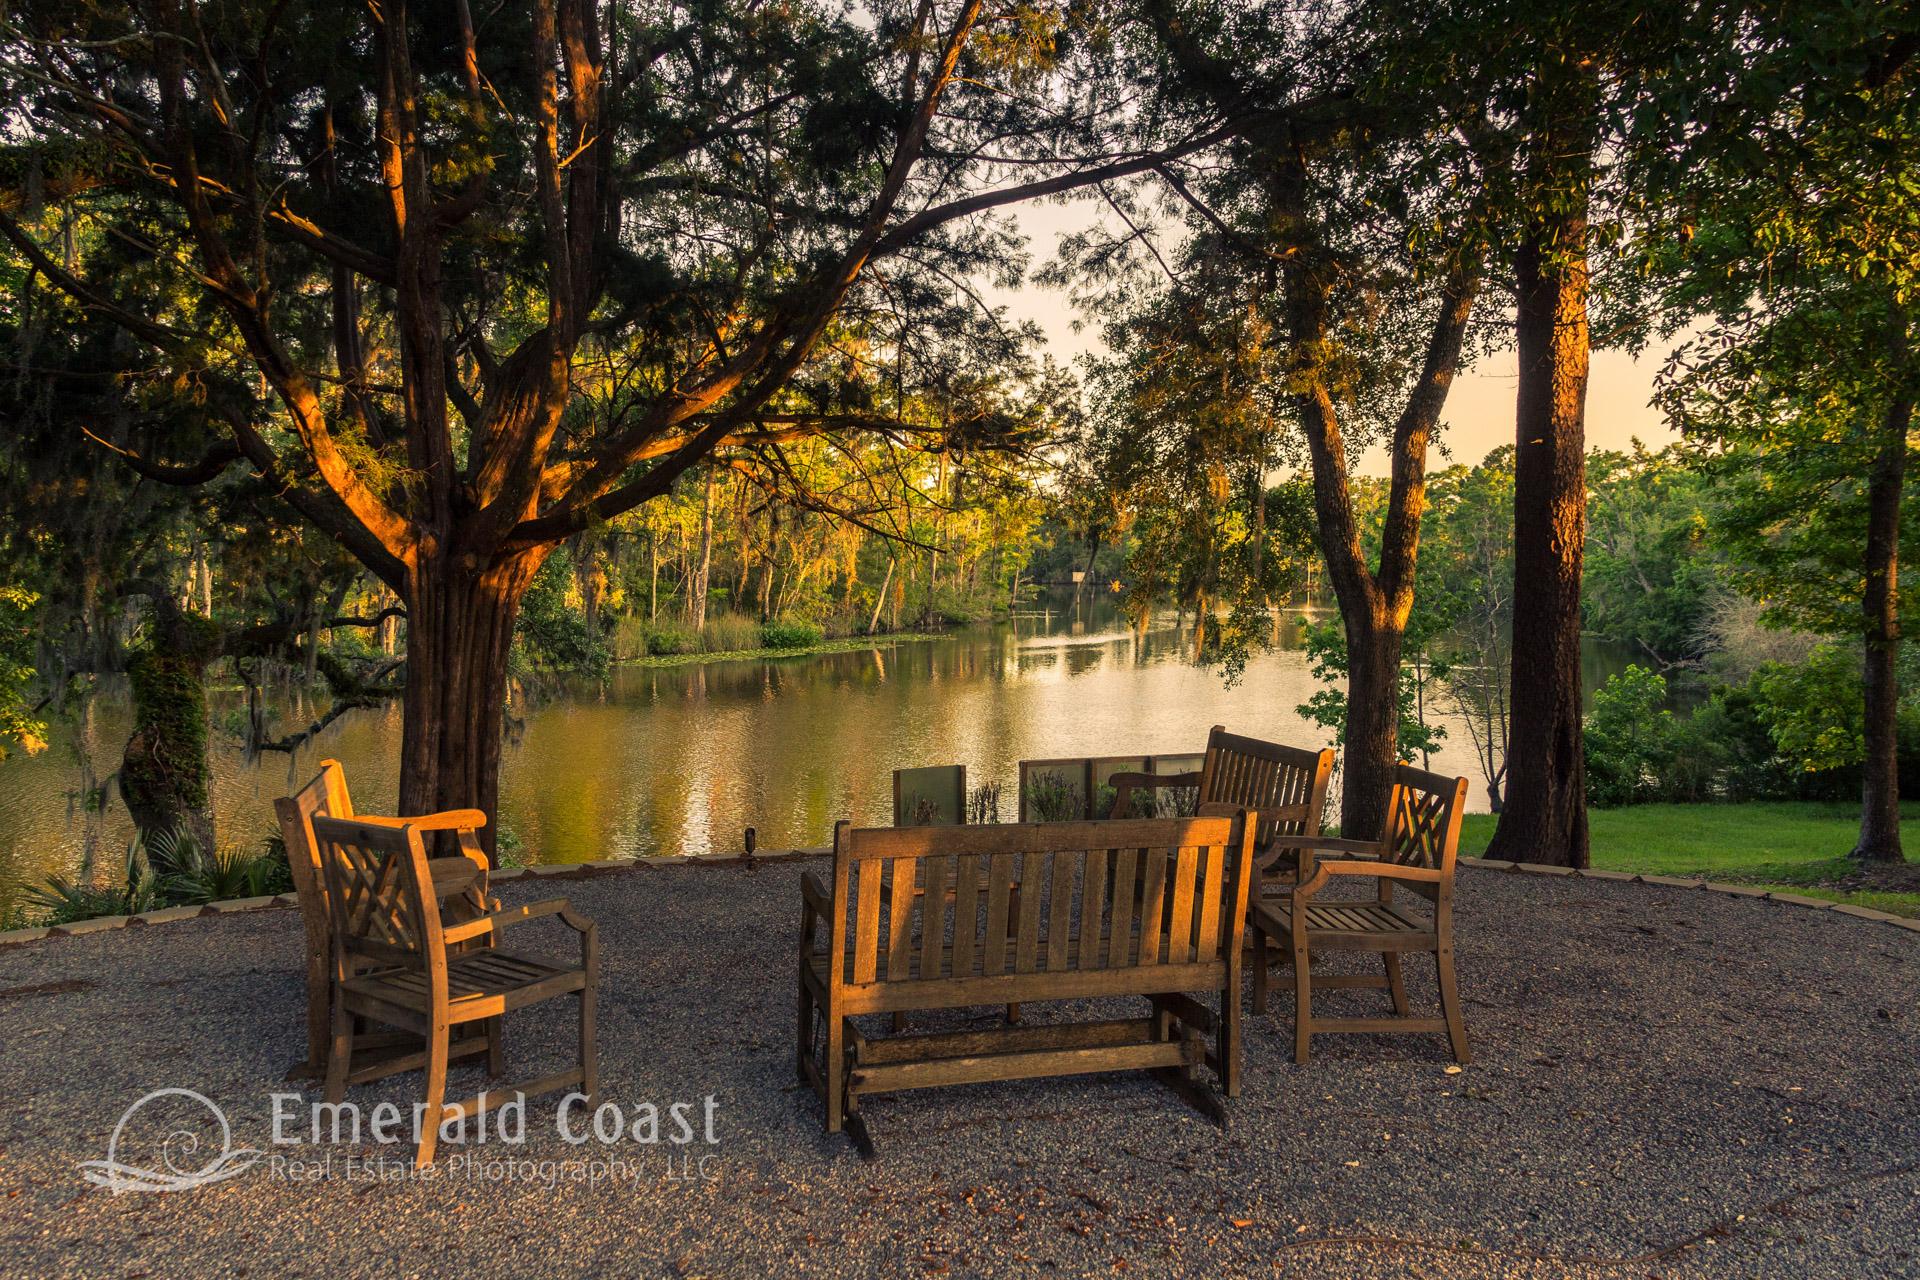 Craigslist Fort Walton Beach >> Emerald Coast Real Estate Photography » Freeport Real ...